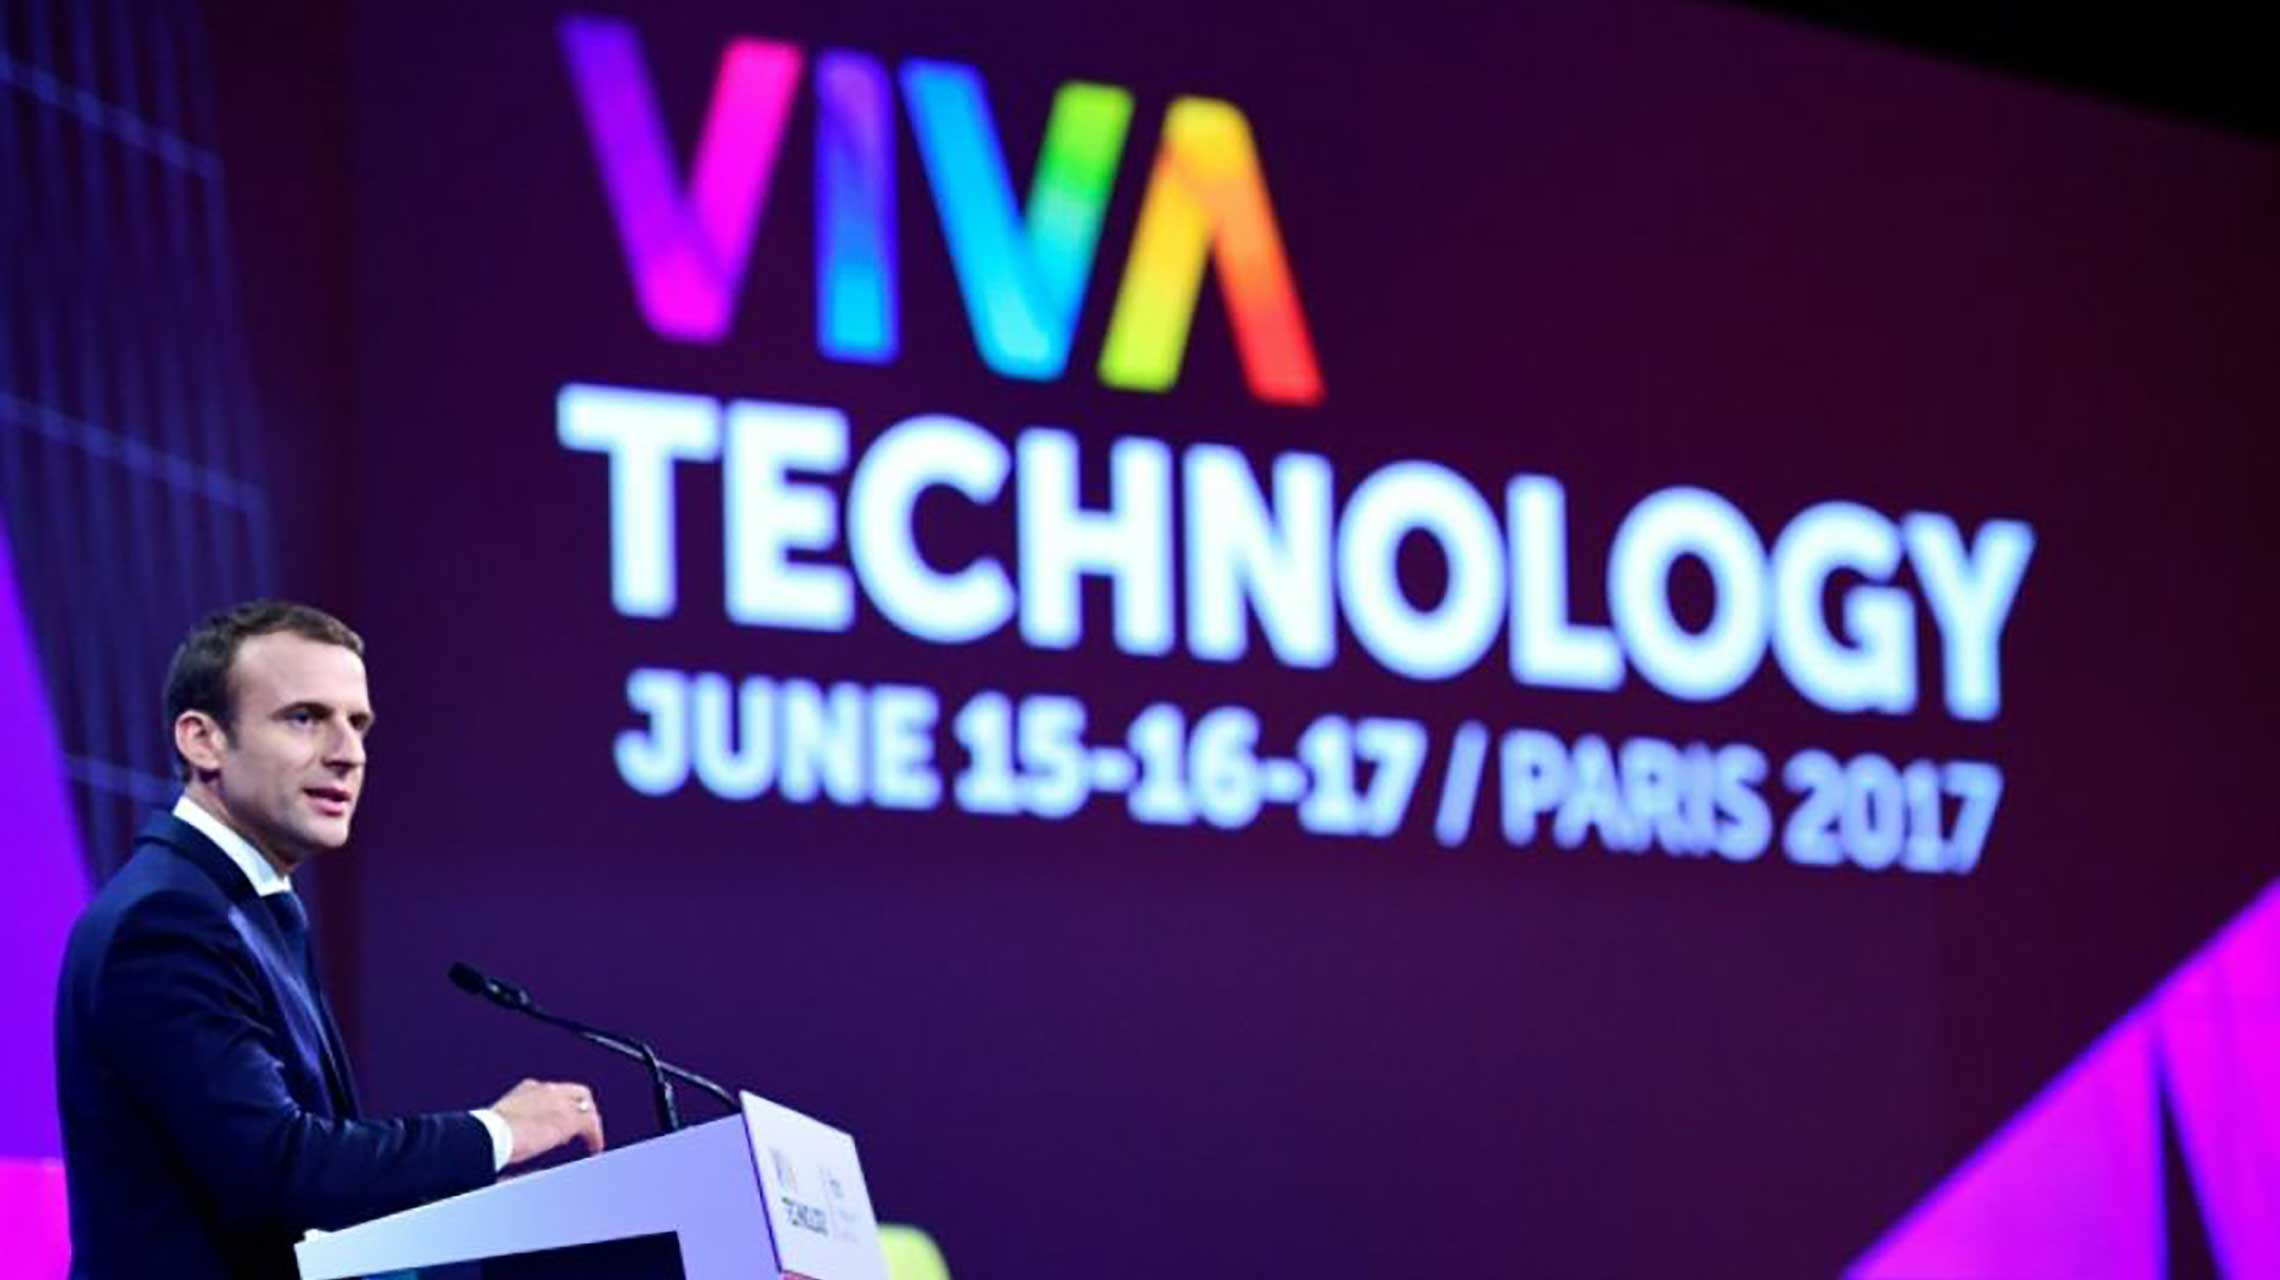 H.Ethe President of France; Emmanuel Macron speaking at the VivaTechconference held in Paris last week. (Photo Courtesy)